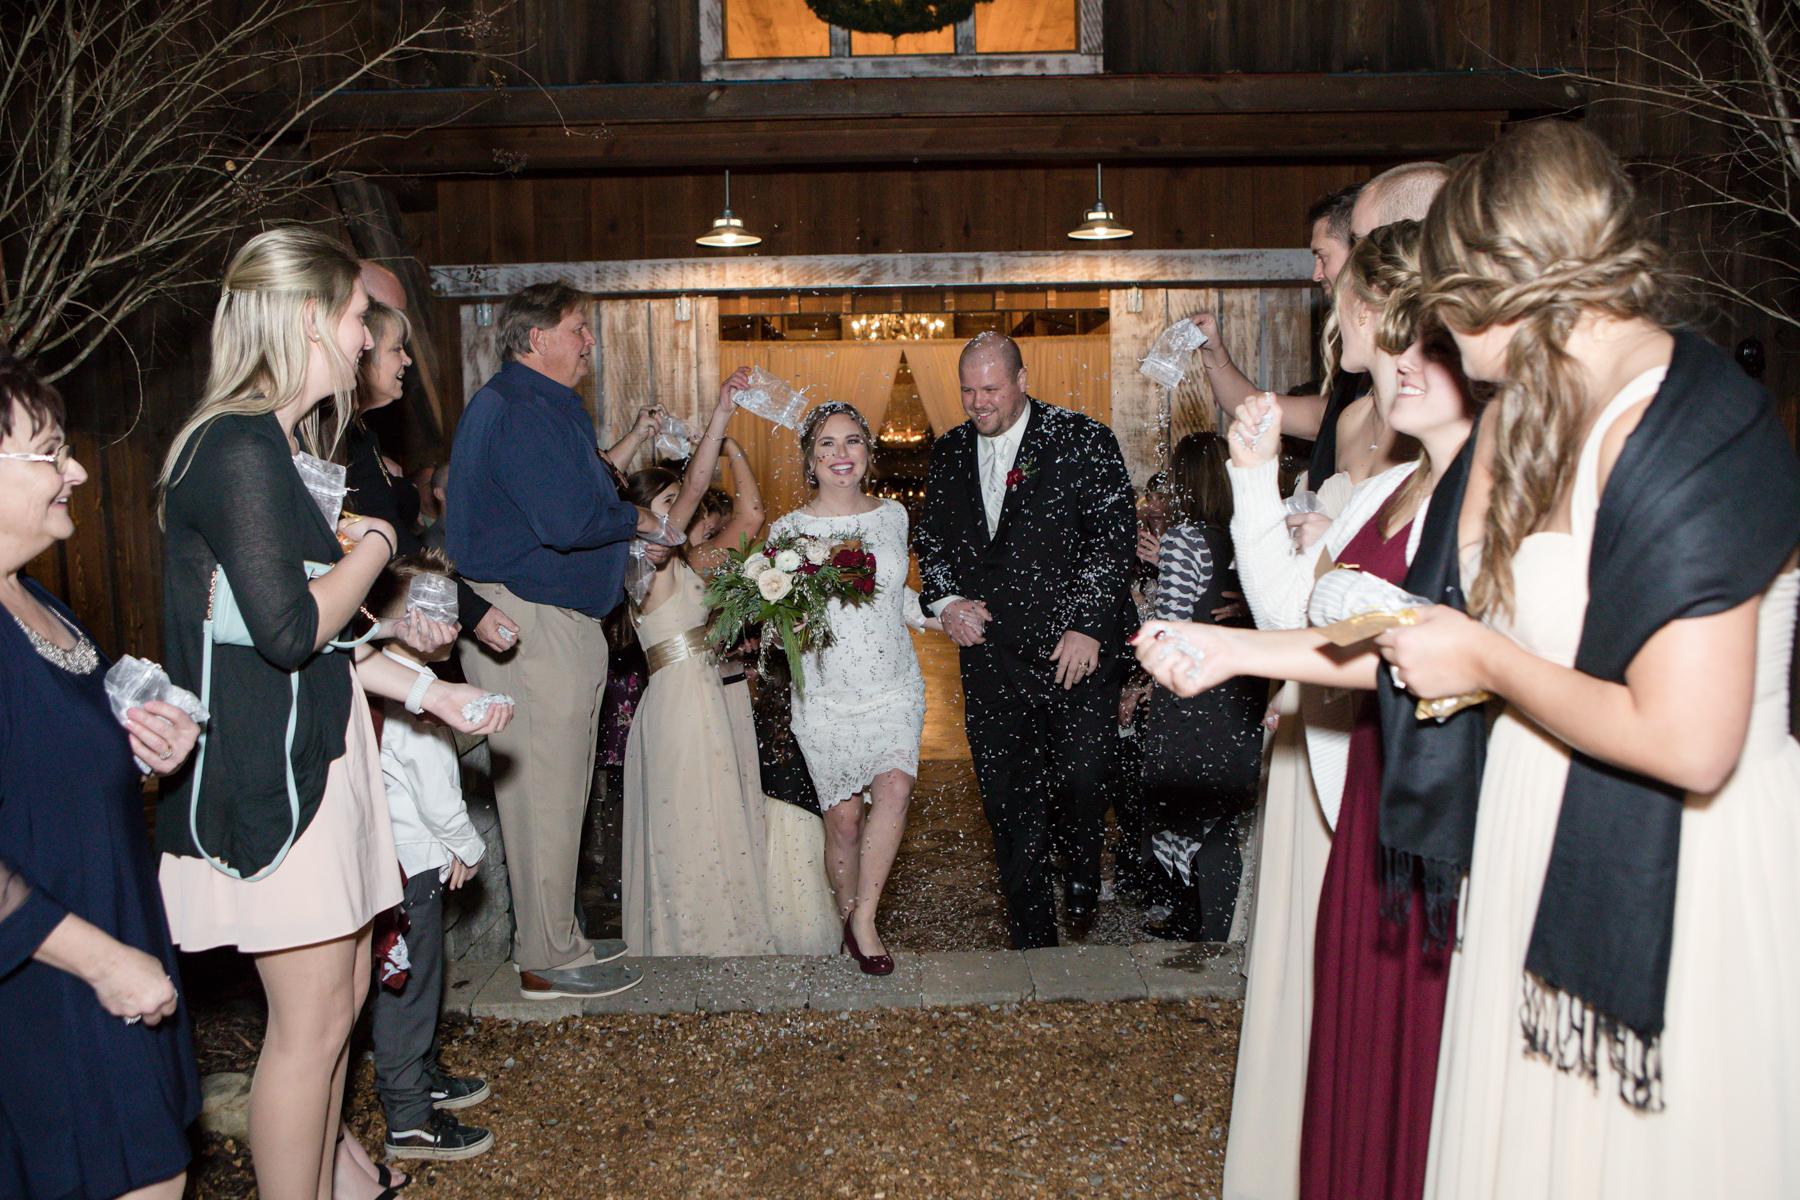 confetti-wedding-exit-homestead-manor.jpg